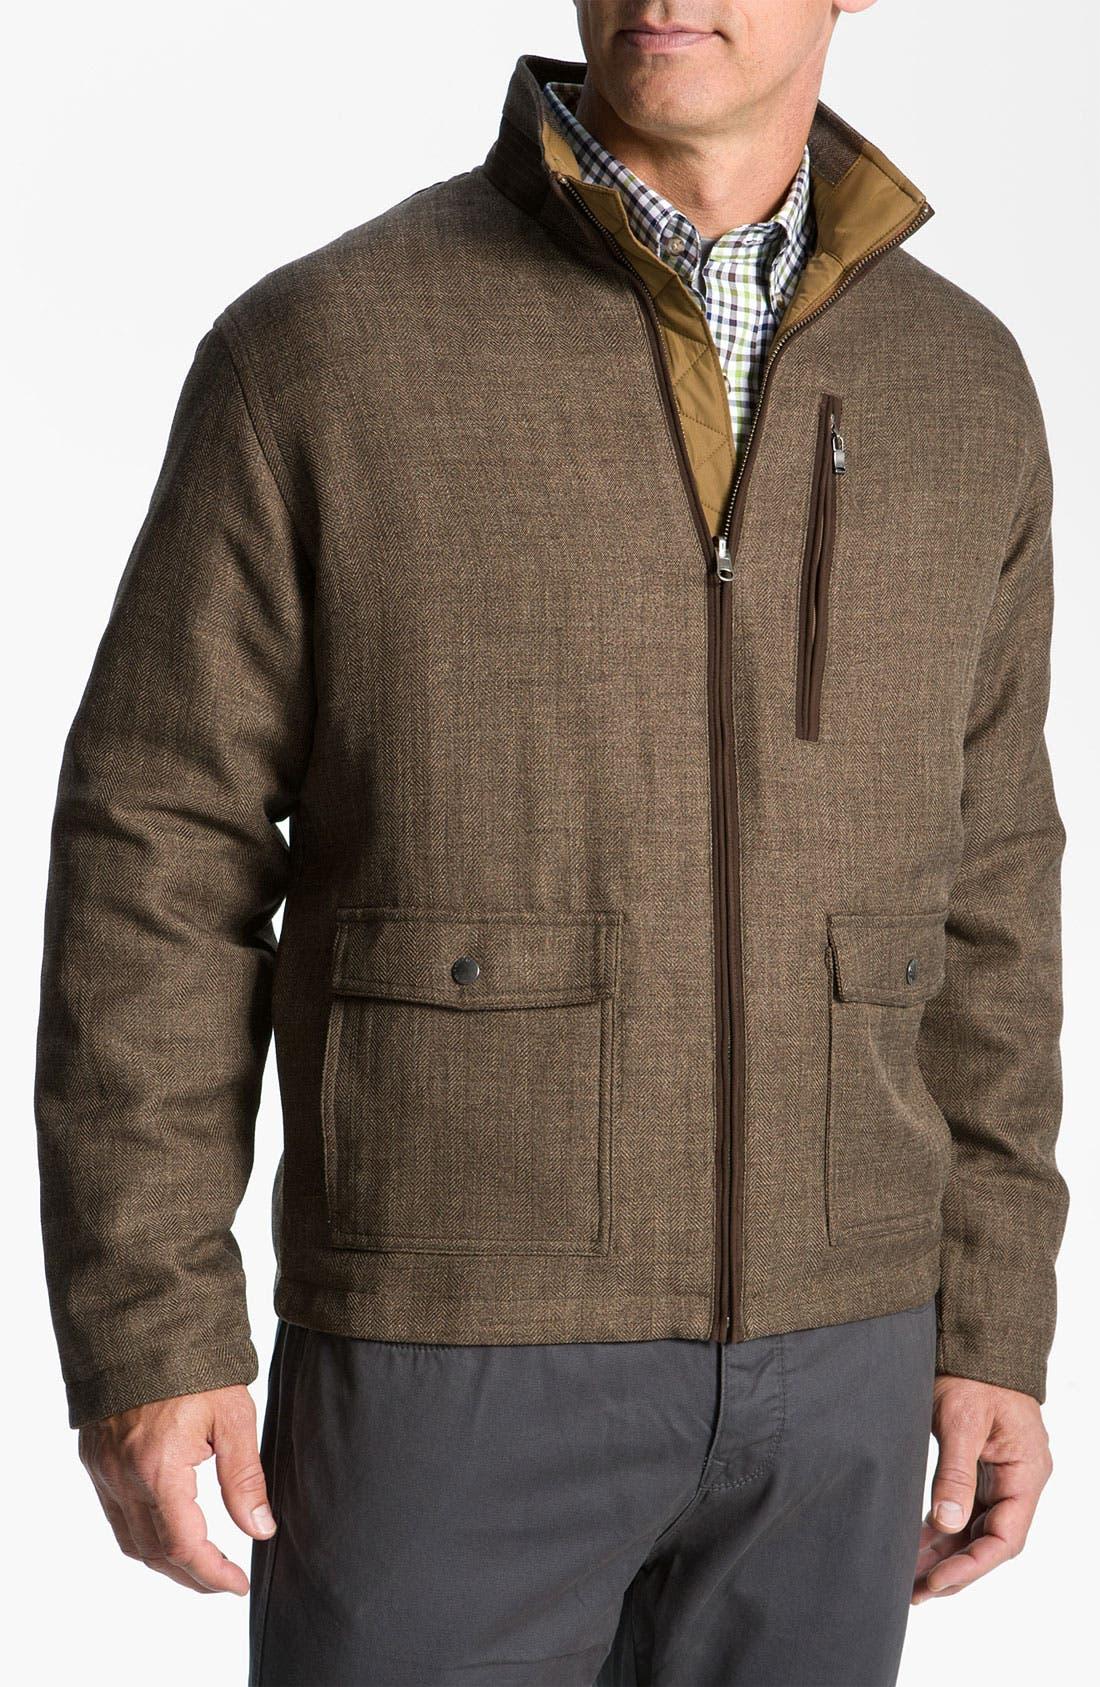 Main Image - Cutter & Buck 'WeatherTec Bearsden' Reversible Jacket (Online Only)